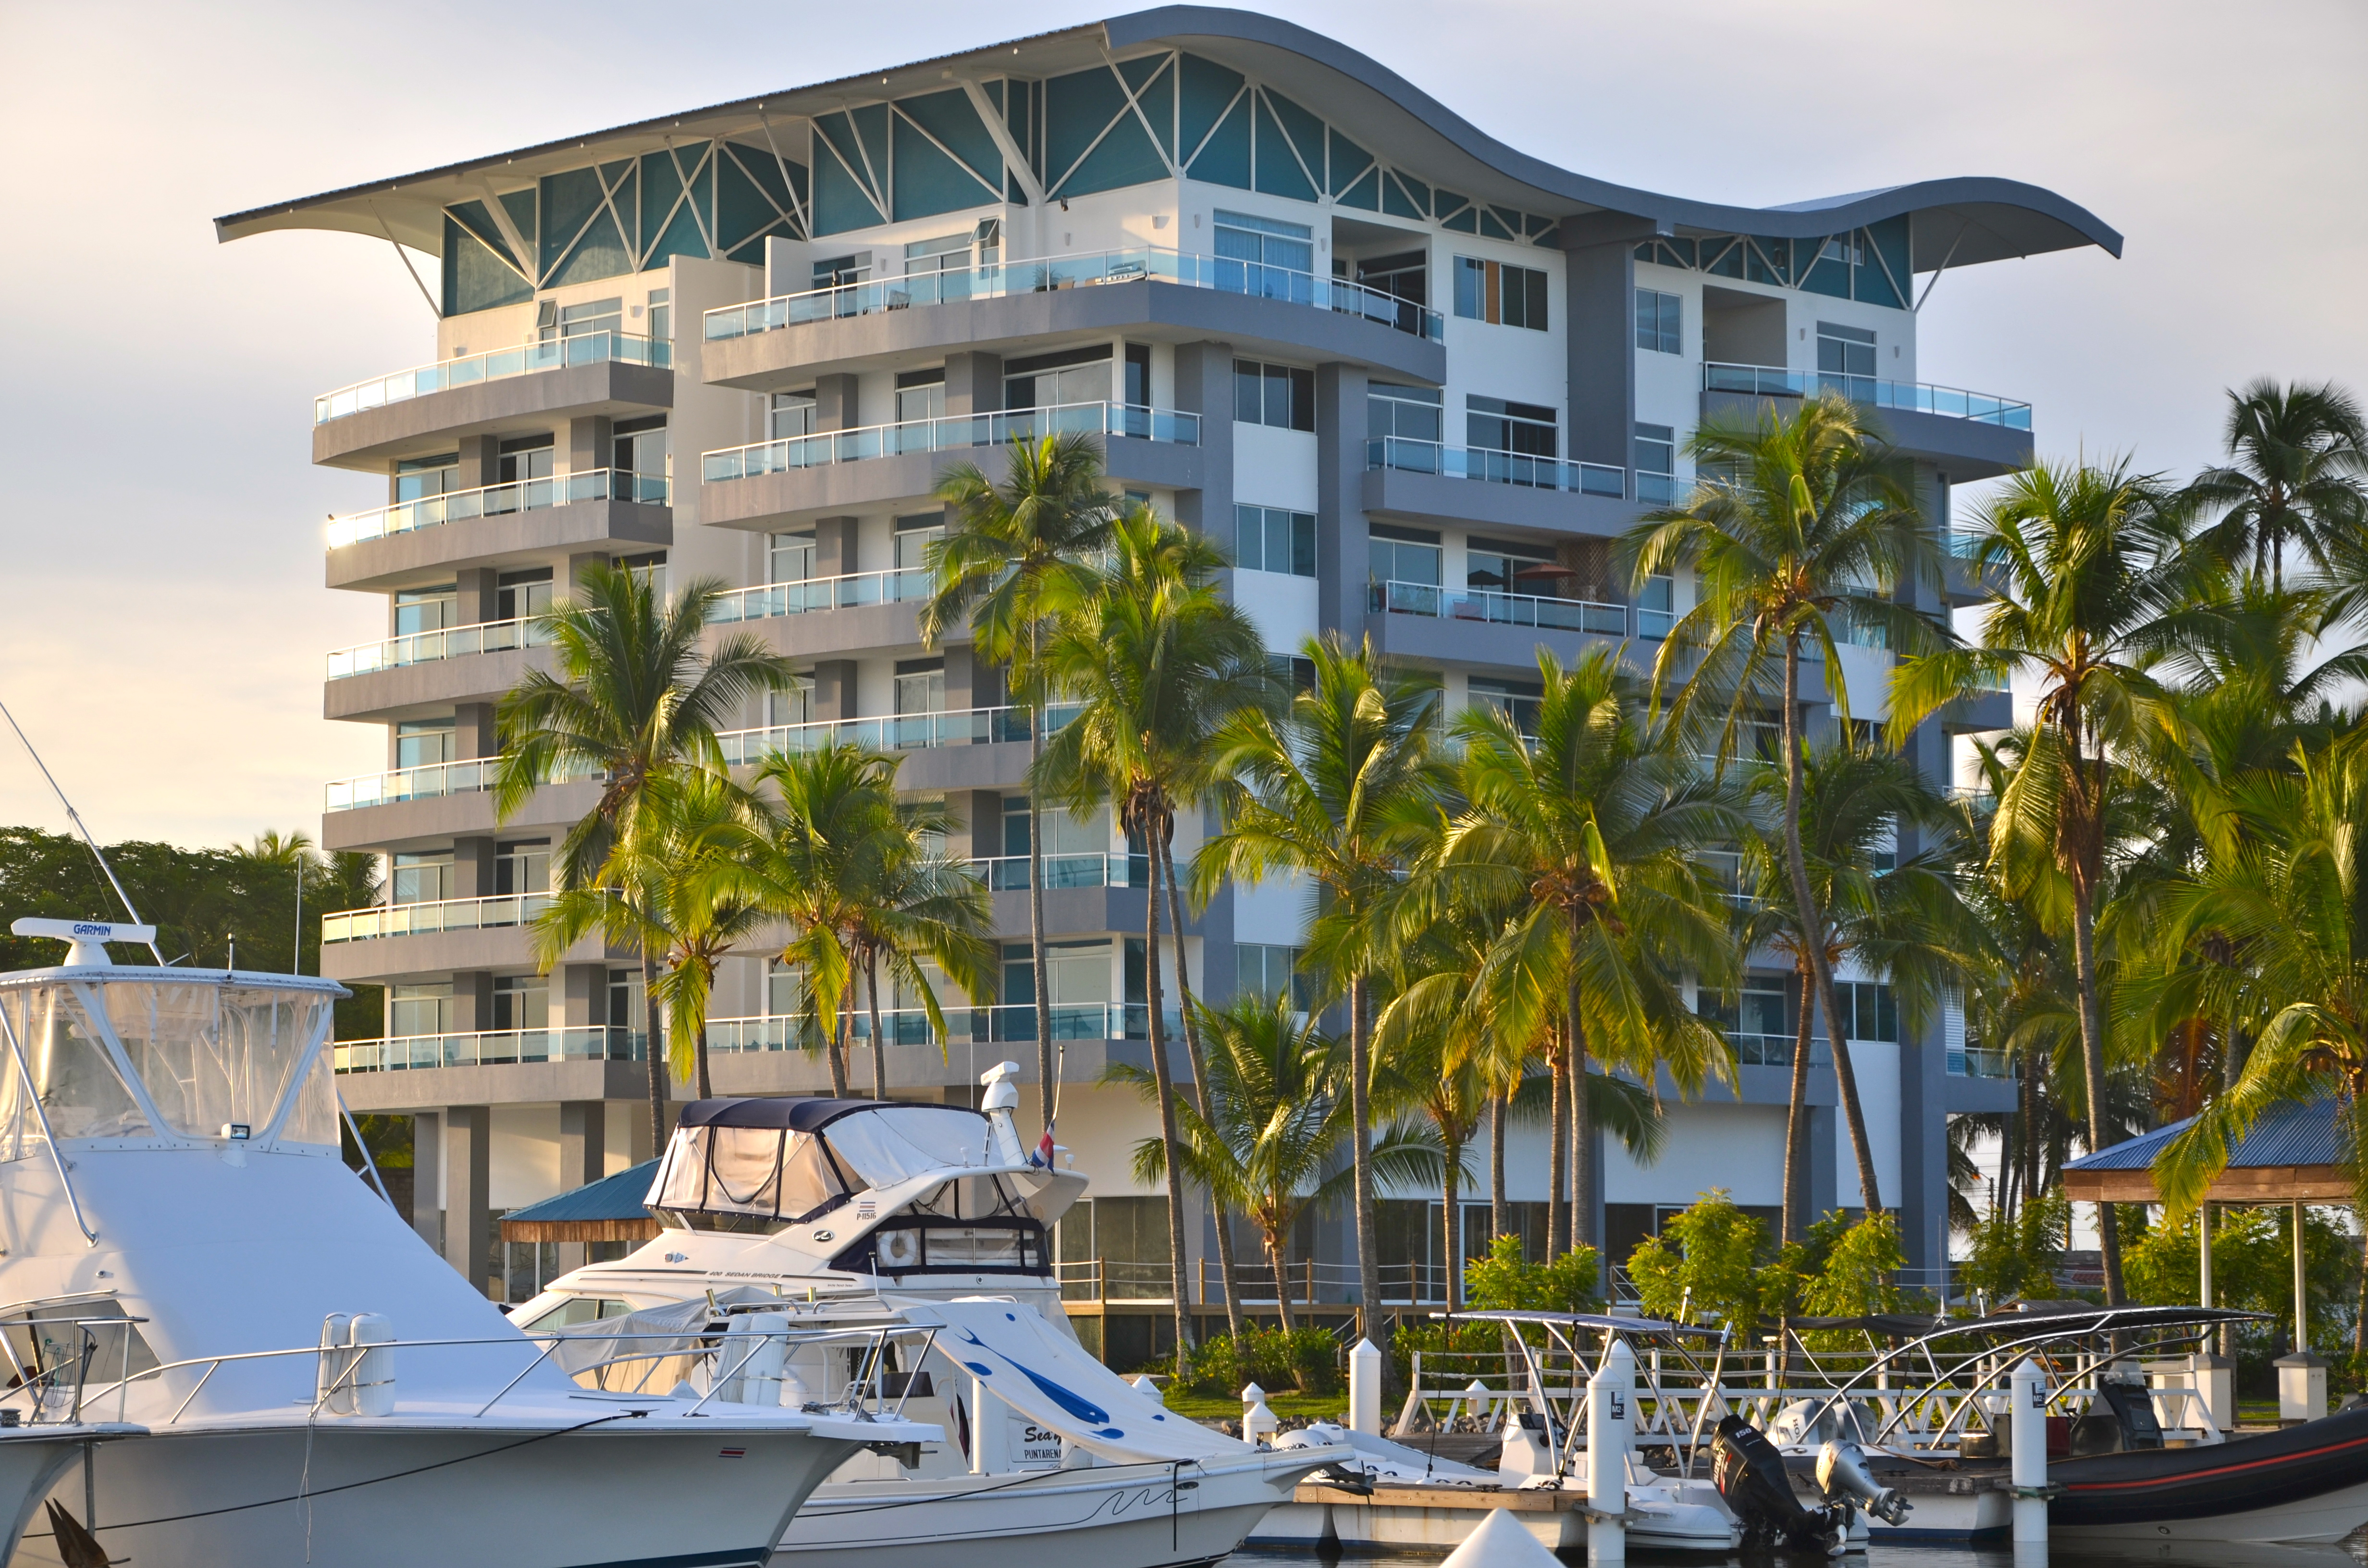 Puerto Azul Marina & Resort